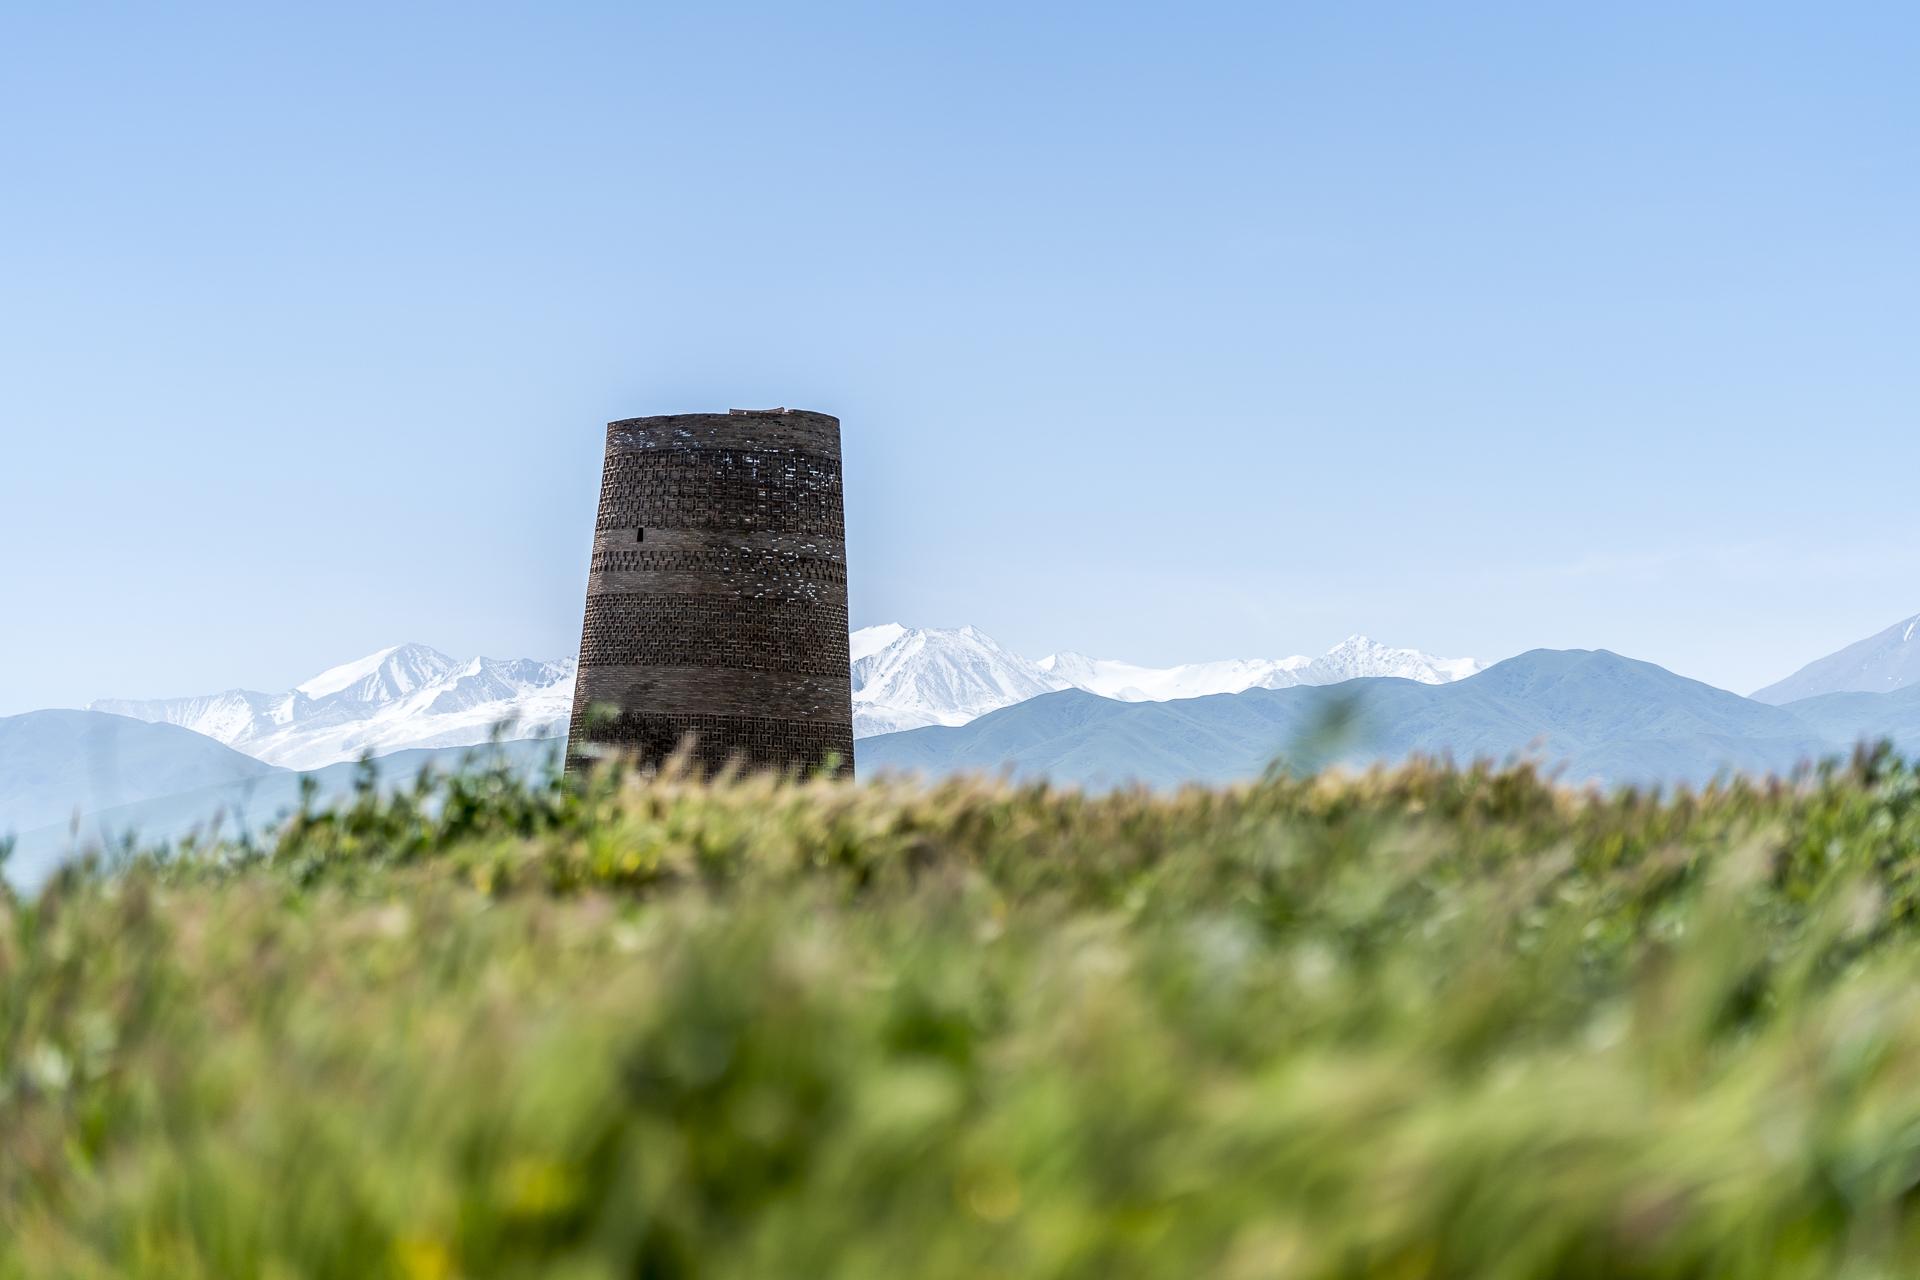 Sehenswürdigkeit in Kirgistan Burana-Turm